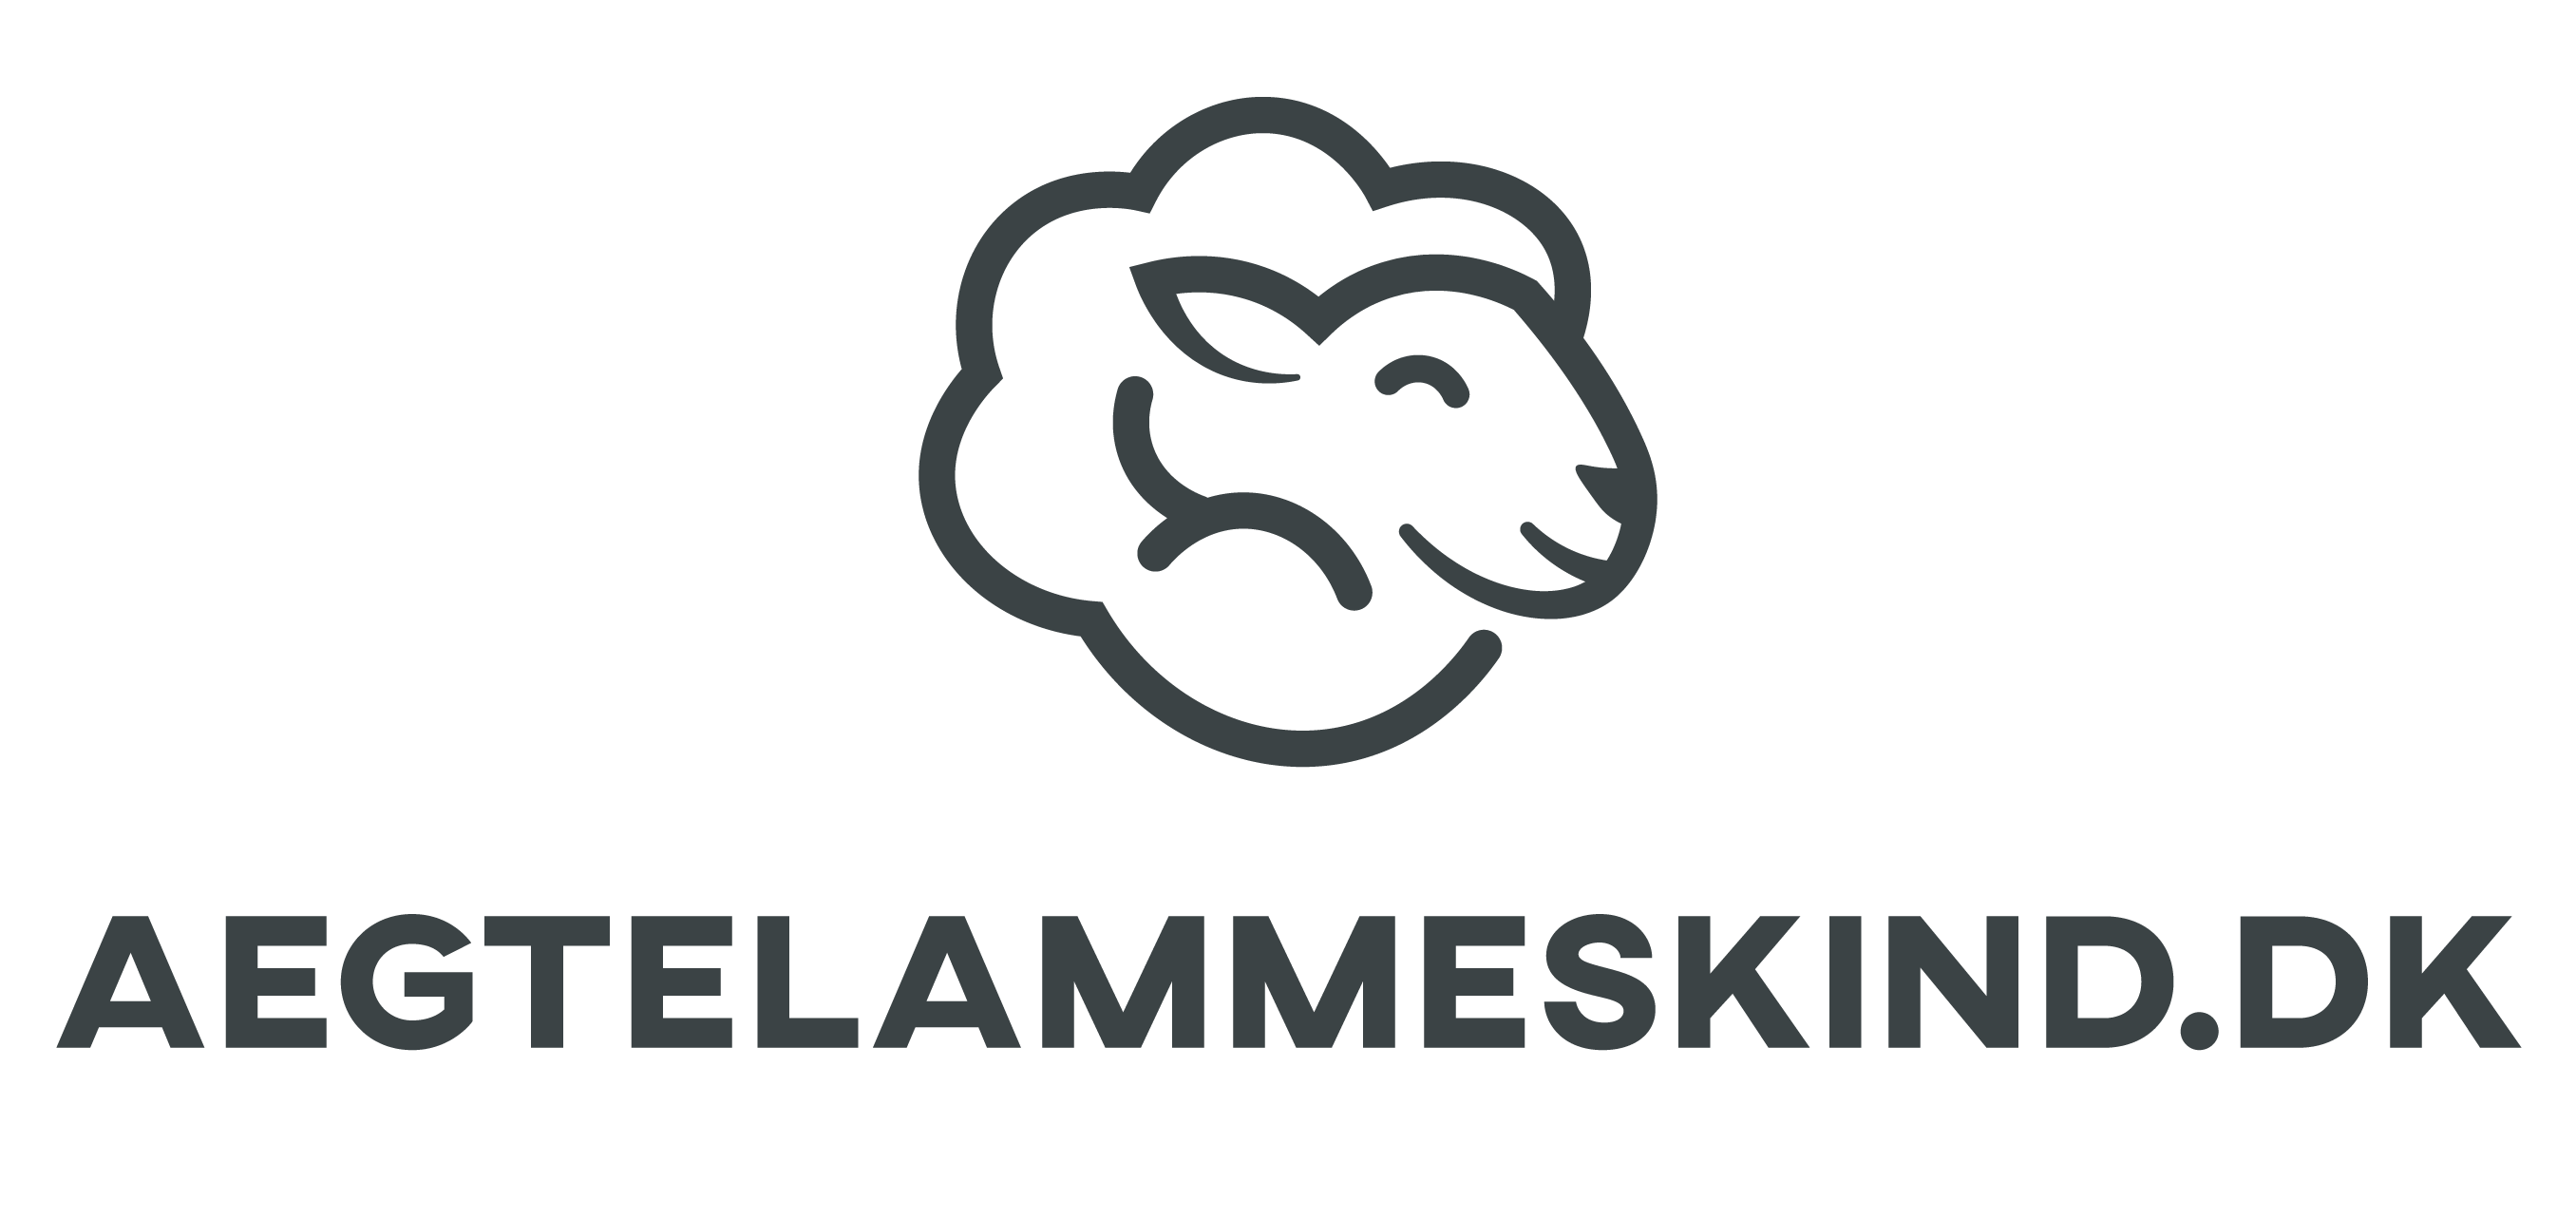 Ægtelammeskind.dk